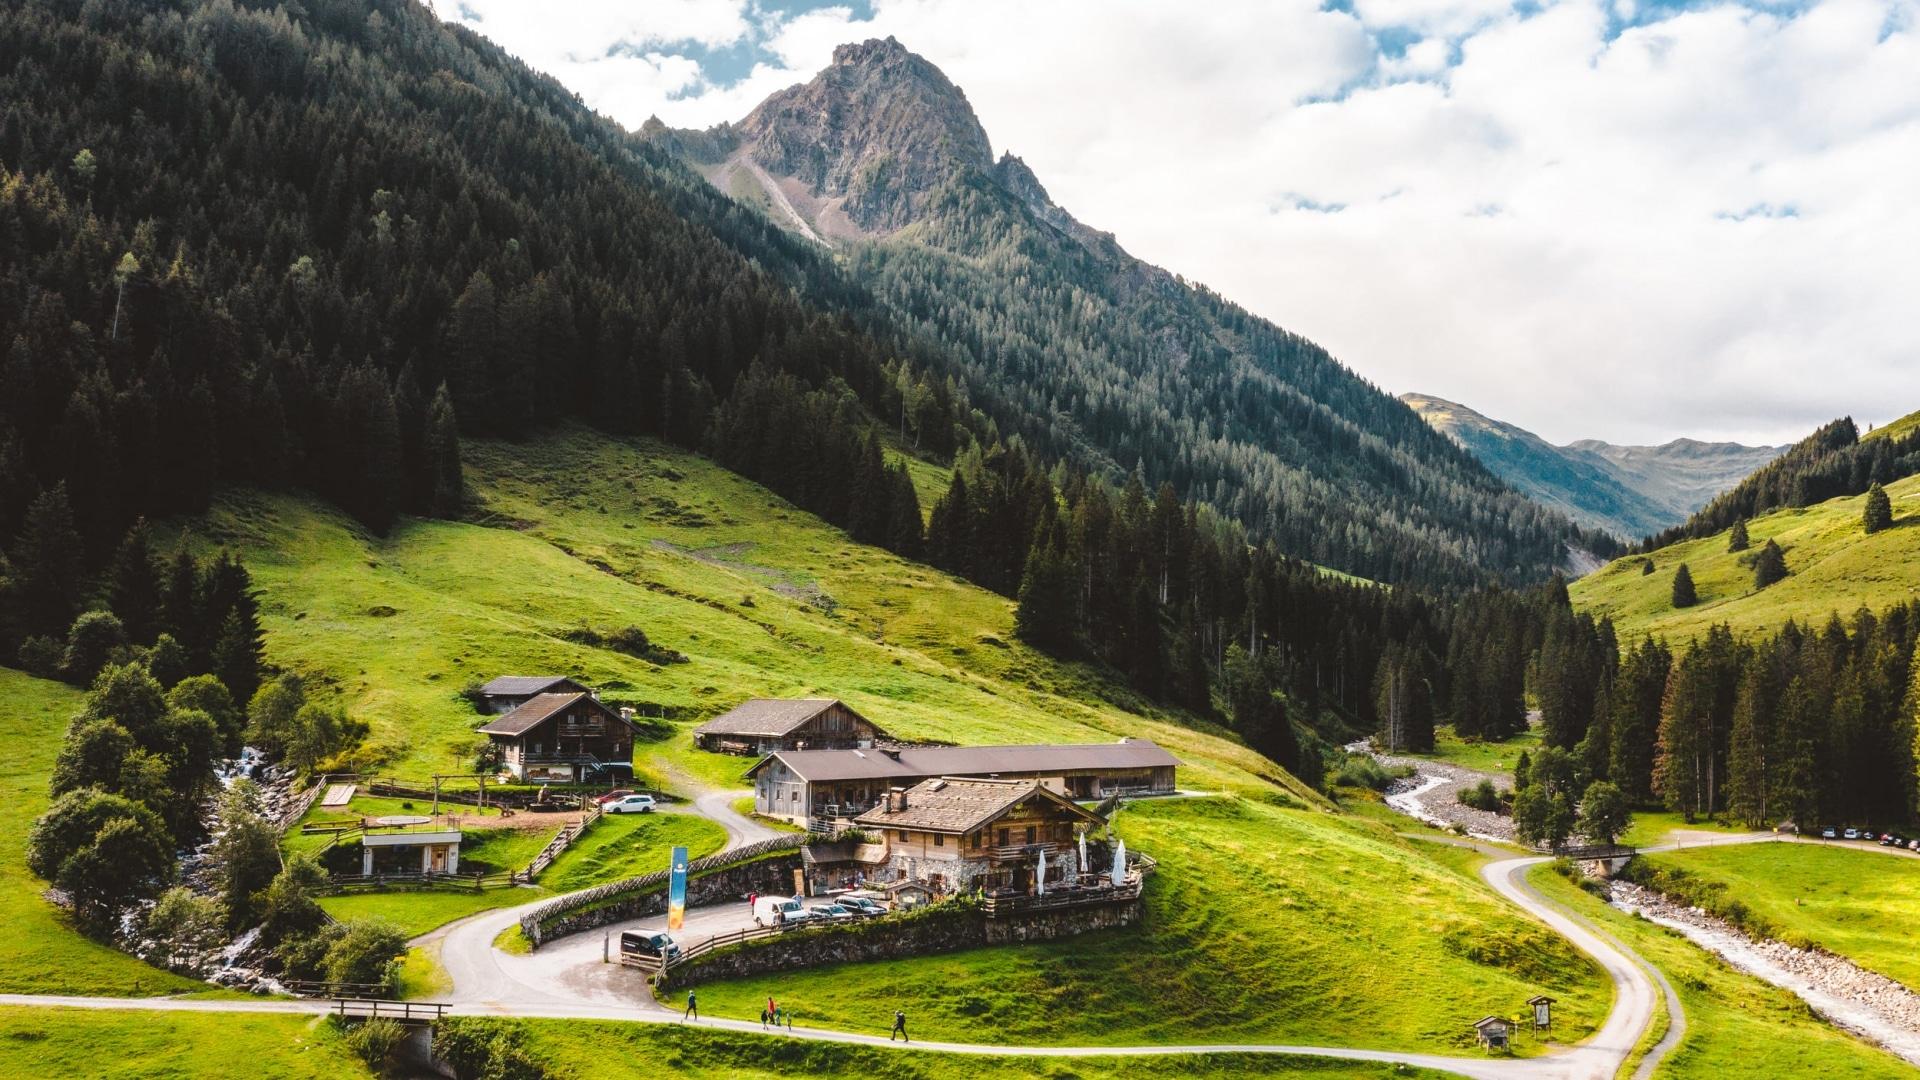 Kasplatzl Kitzbüheler Alpen - Brixental © Mathäus Gartner